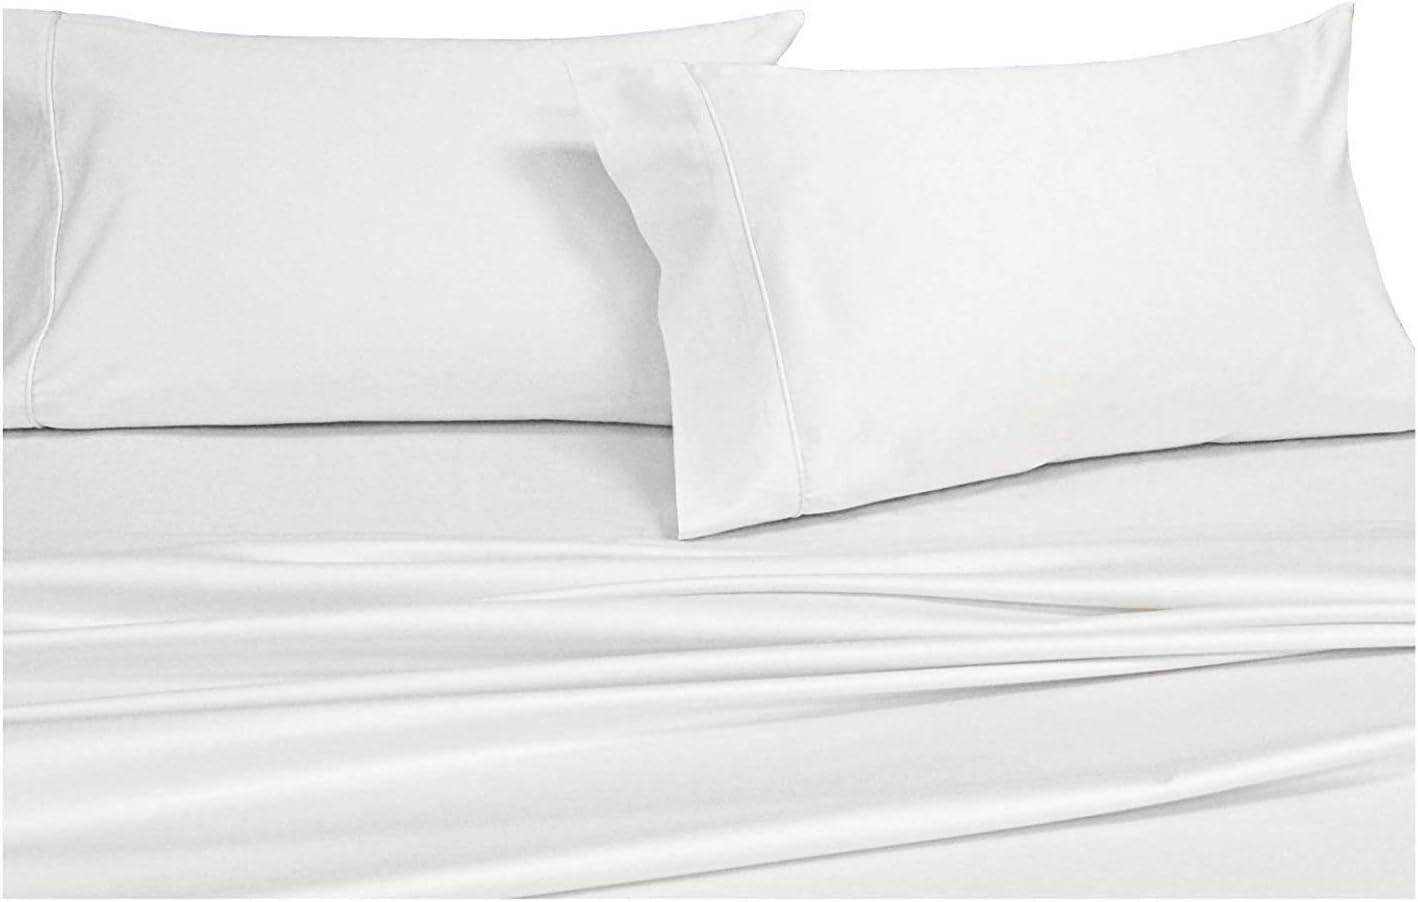 PLUSHY COMFORT Luxury Brand, Split King Sheet Set 5 Piece for Split King Bed Size Only,100 Percent Egyptian Cotton 600 Thread Count, White Plain